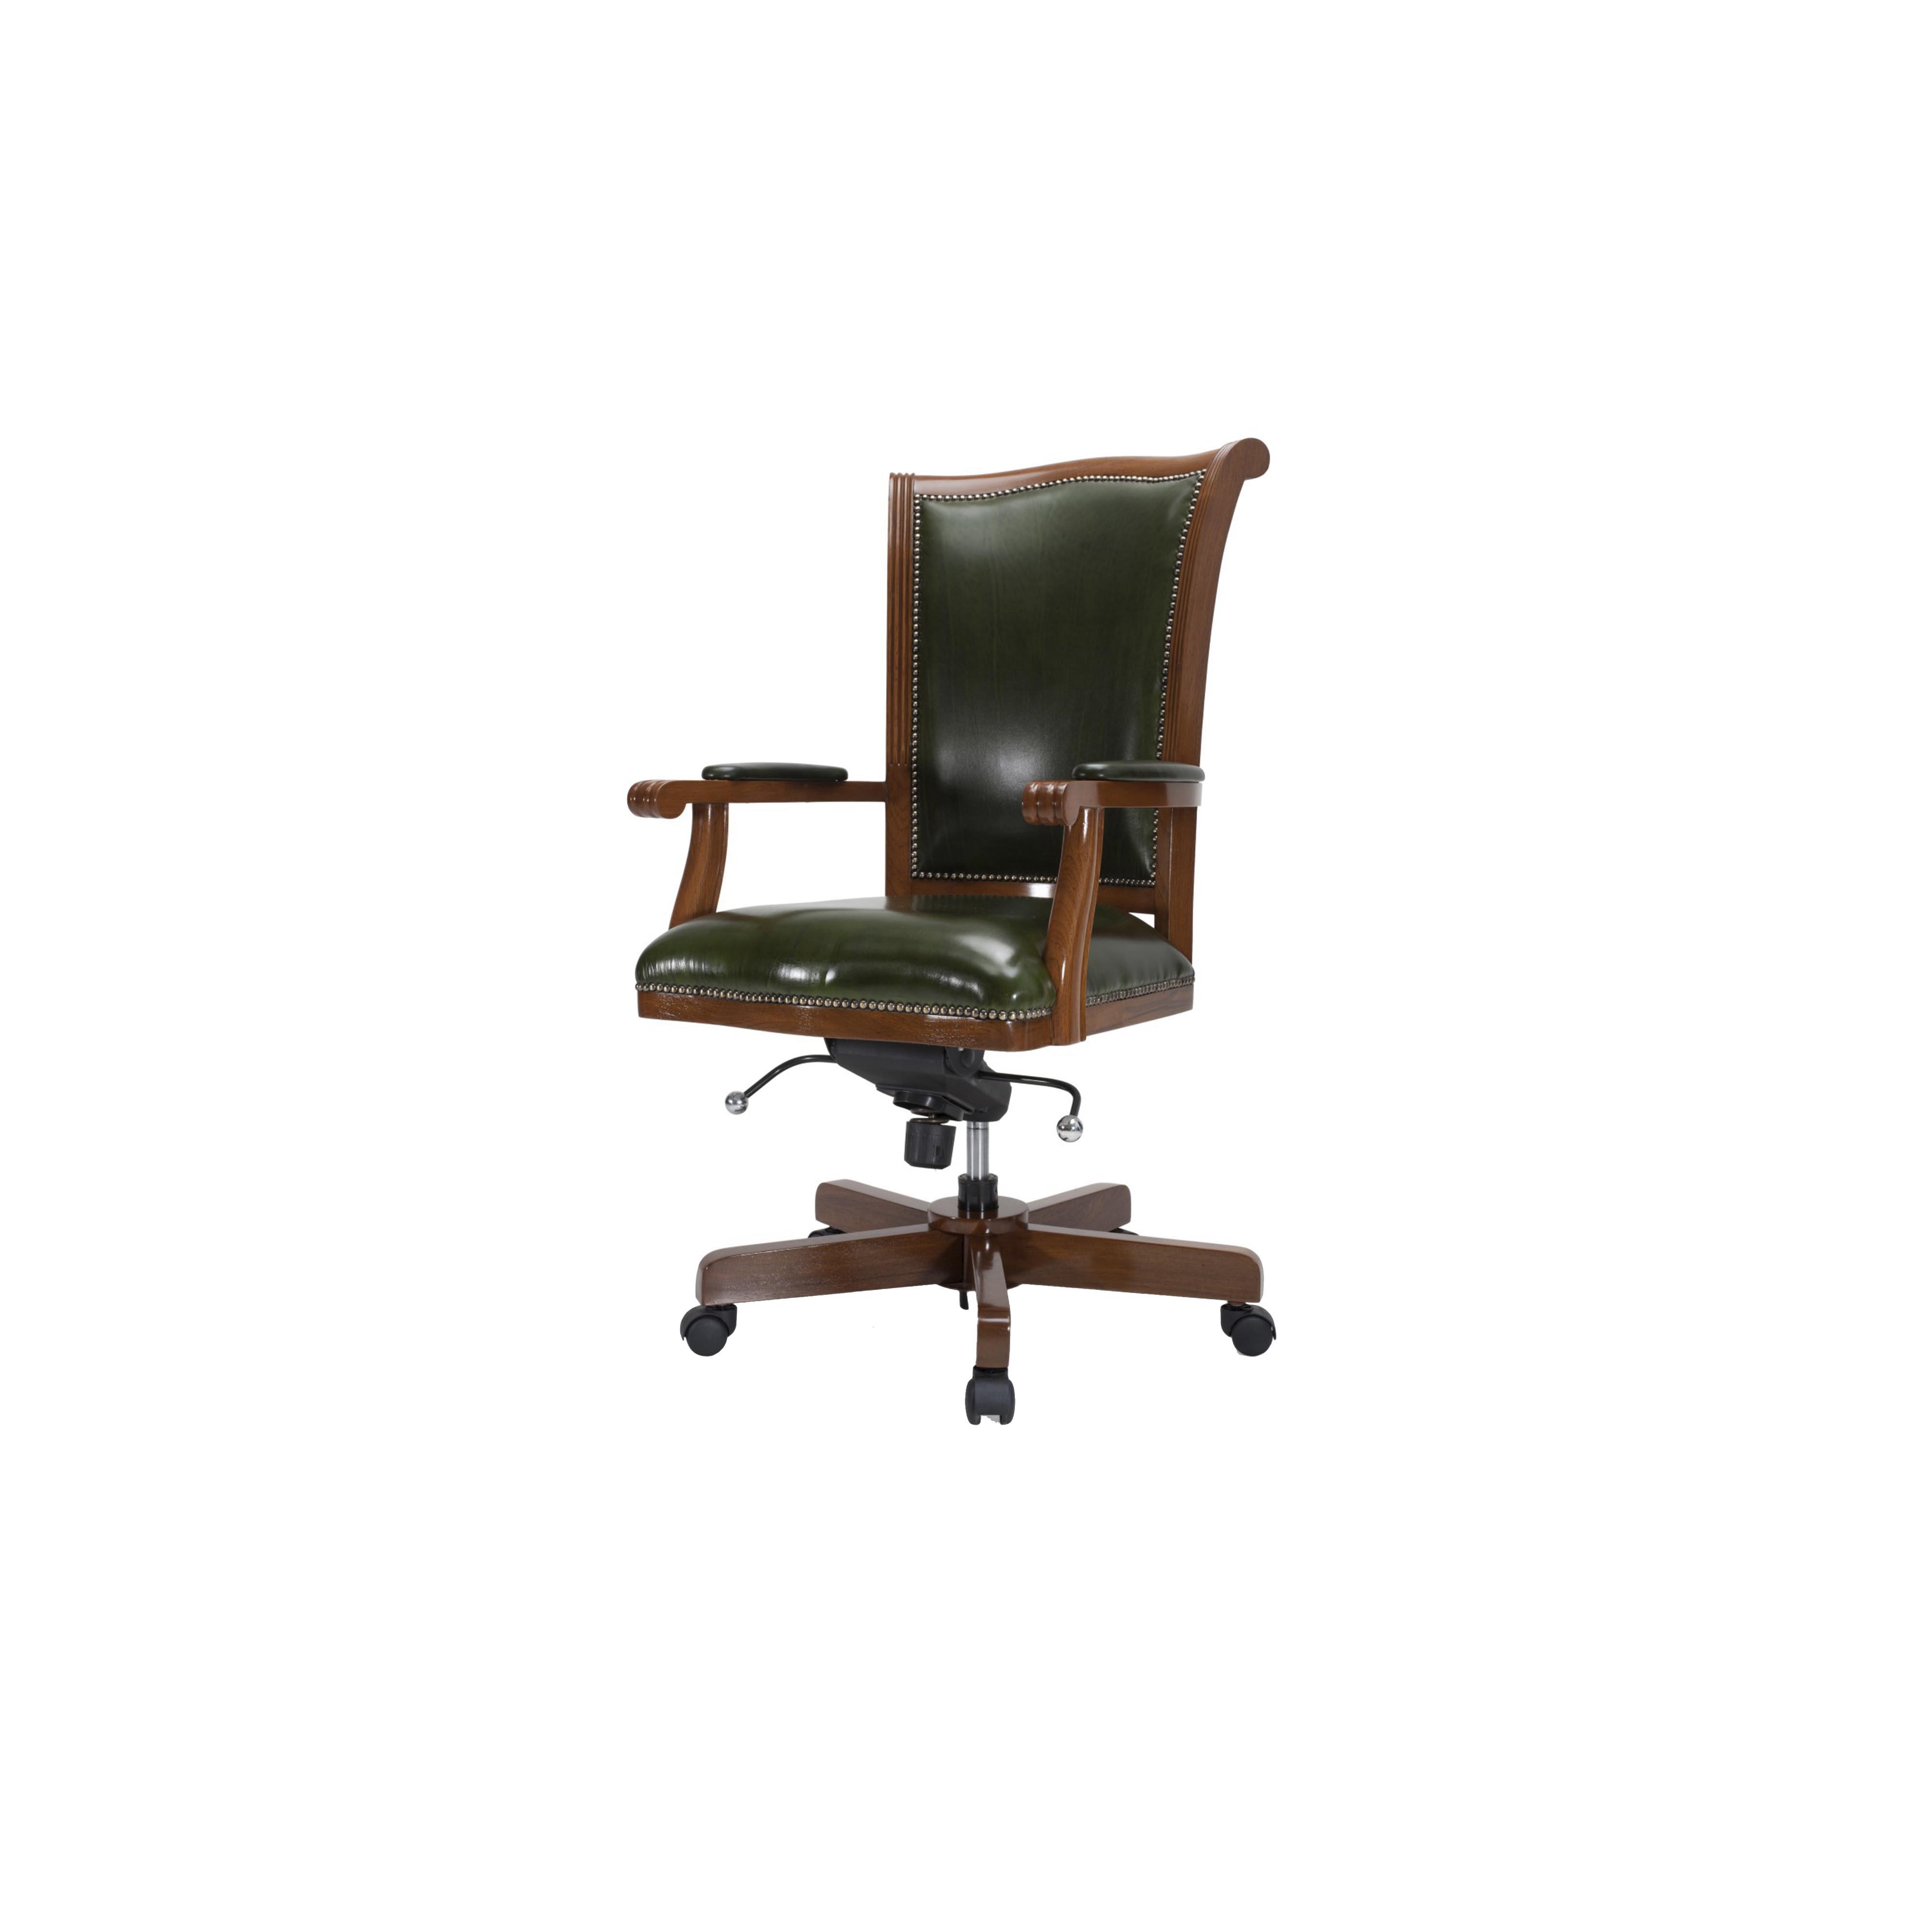 Heritage swivel chair